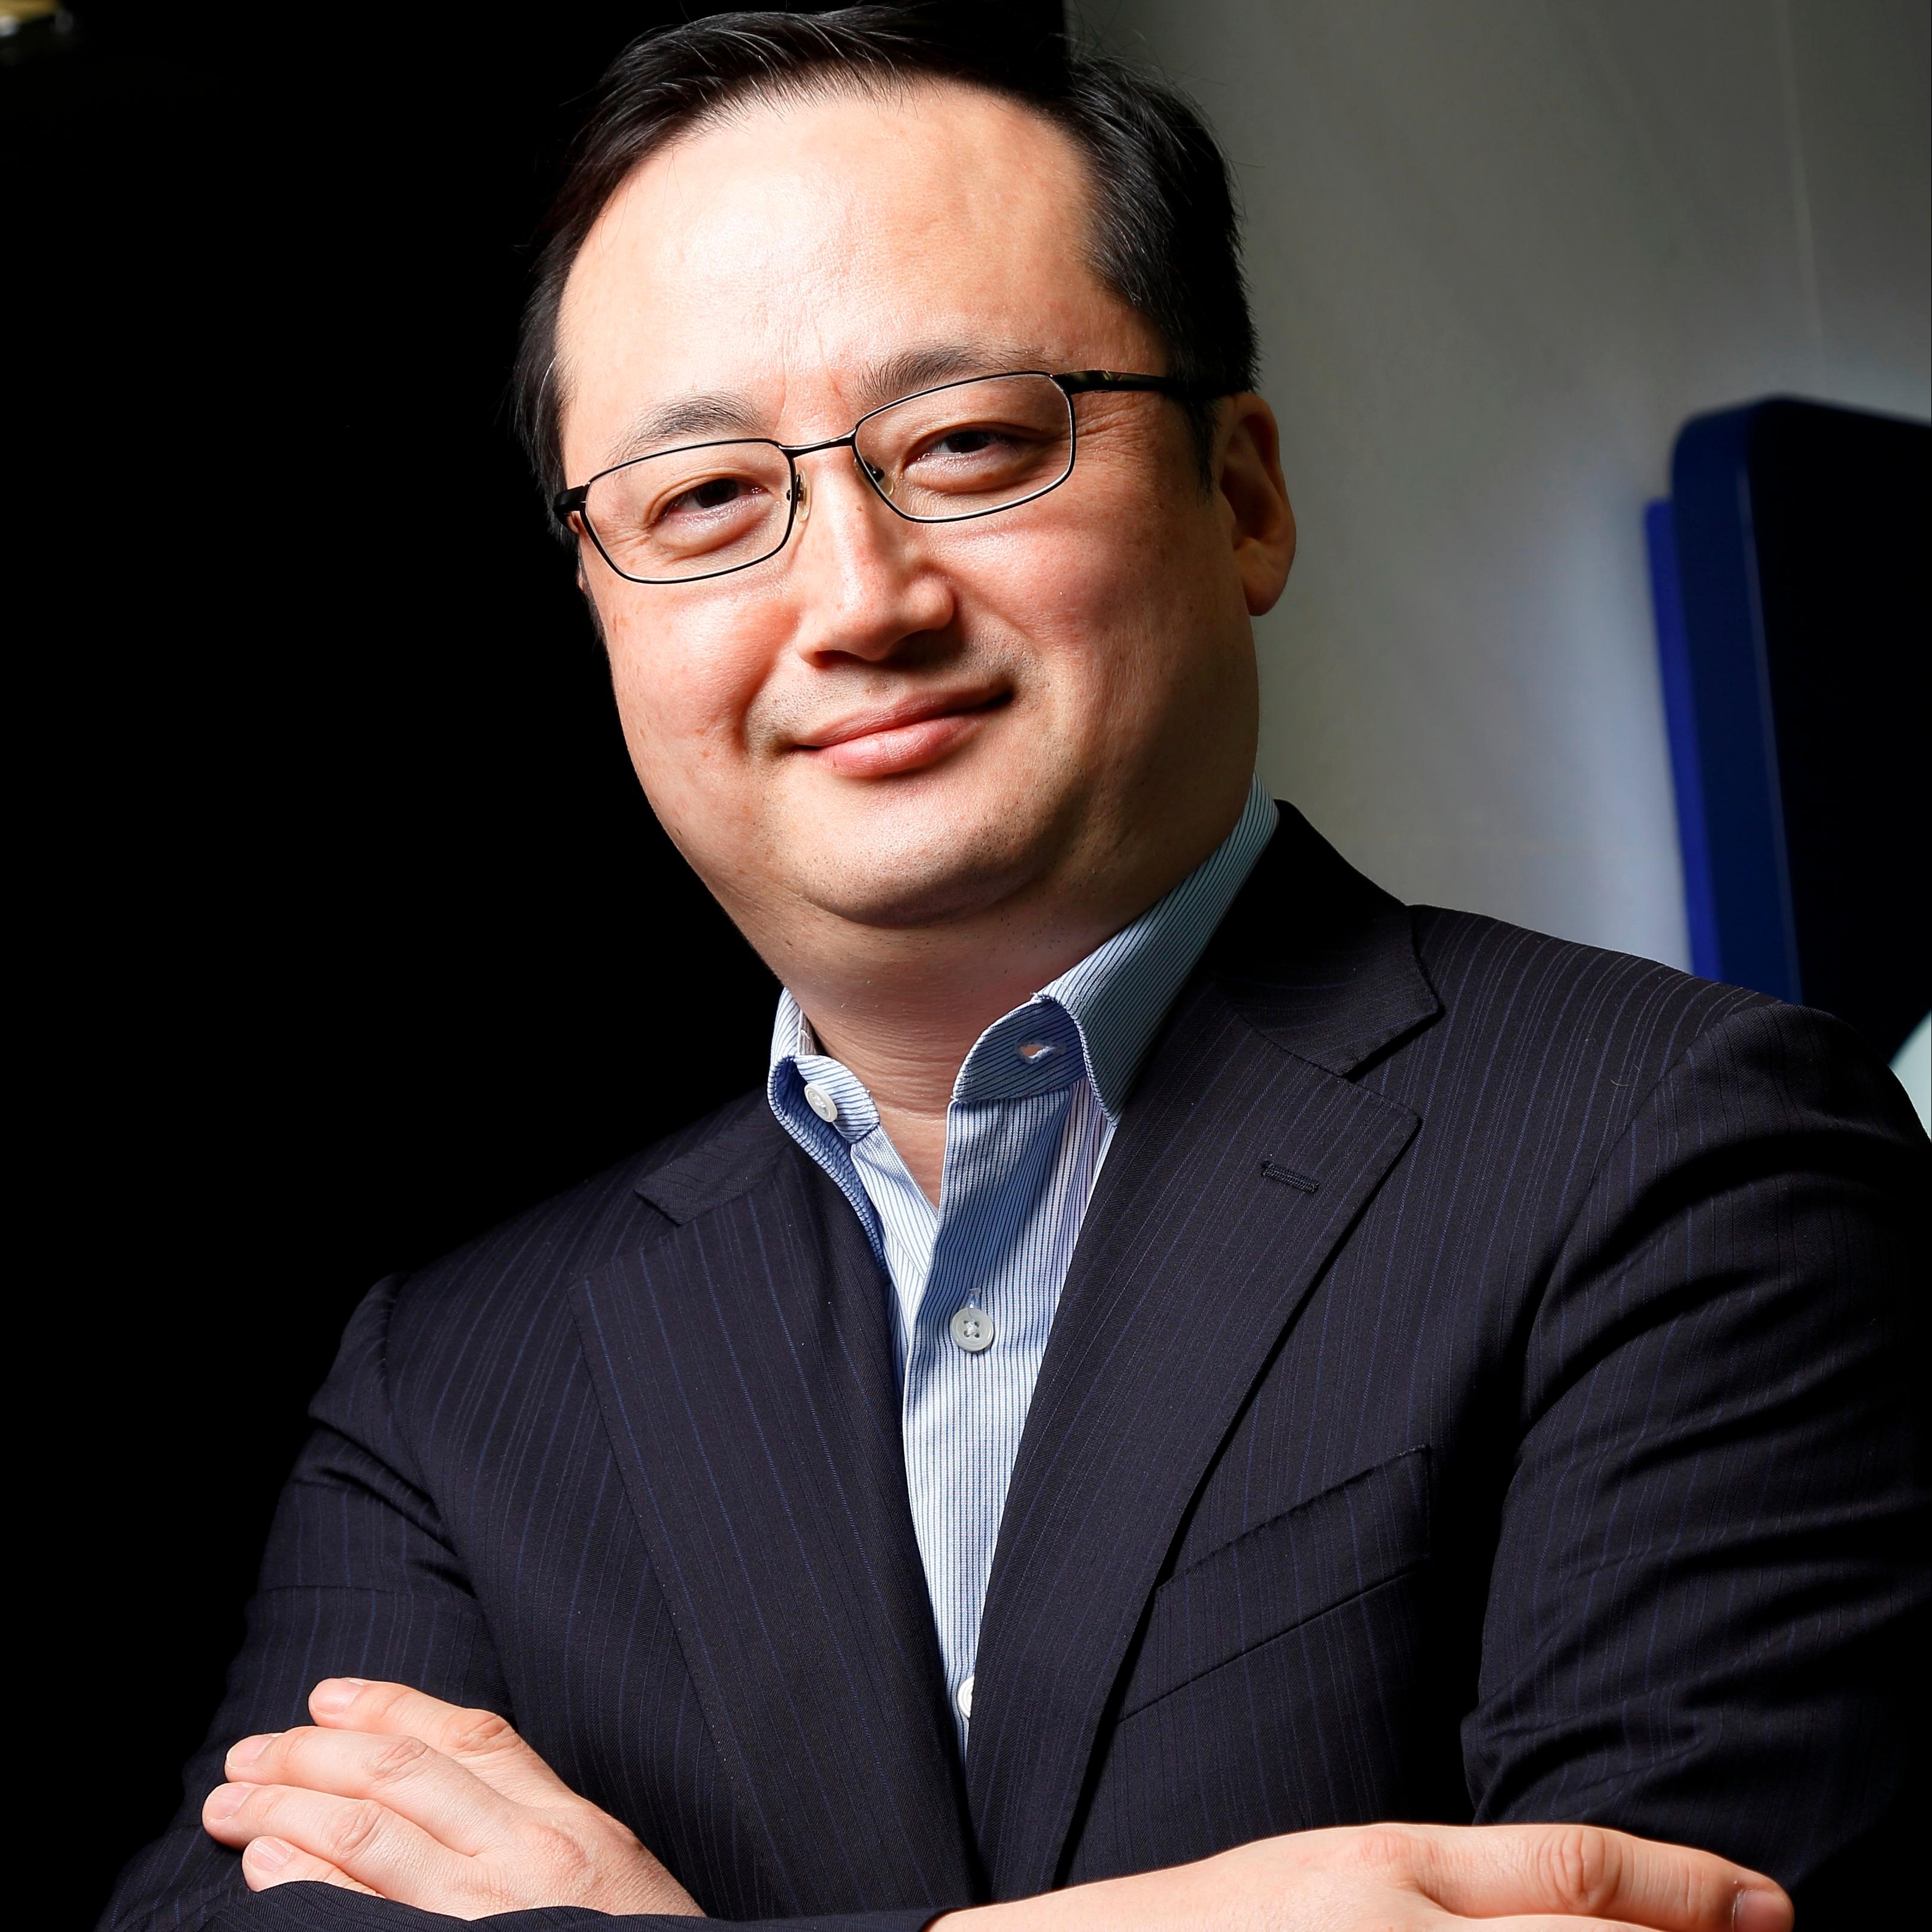 Mr Thomas Choi